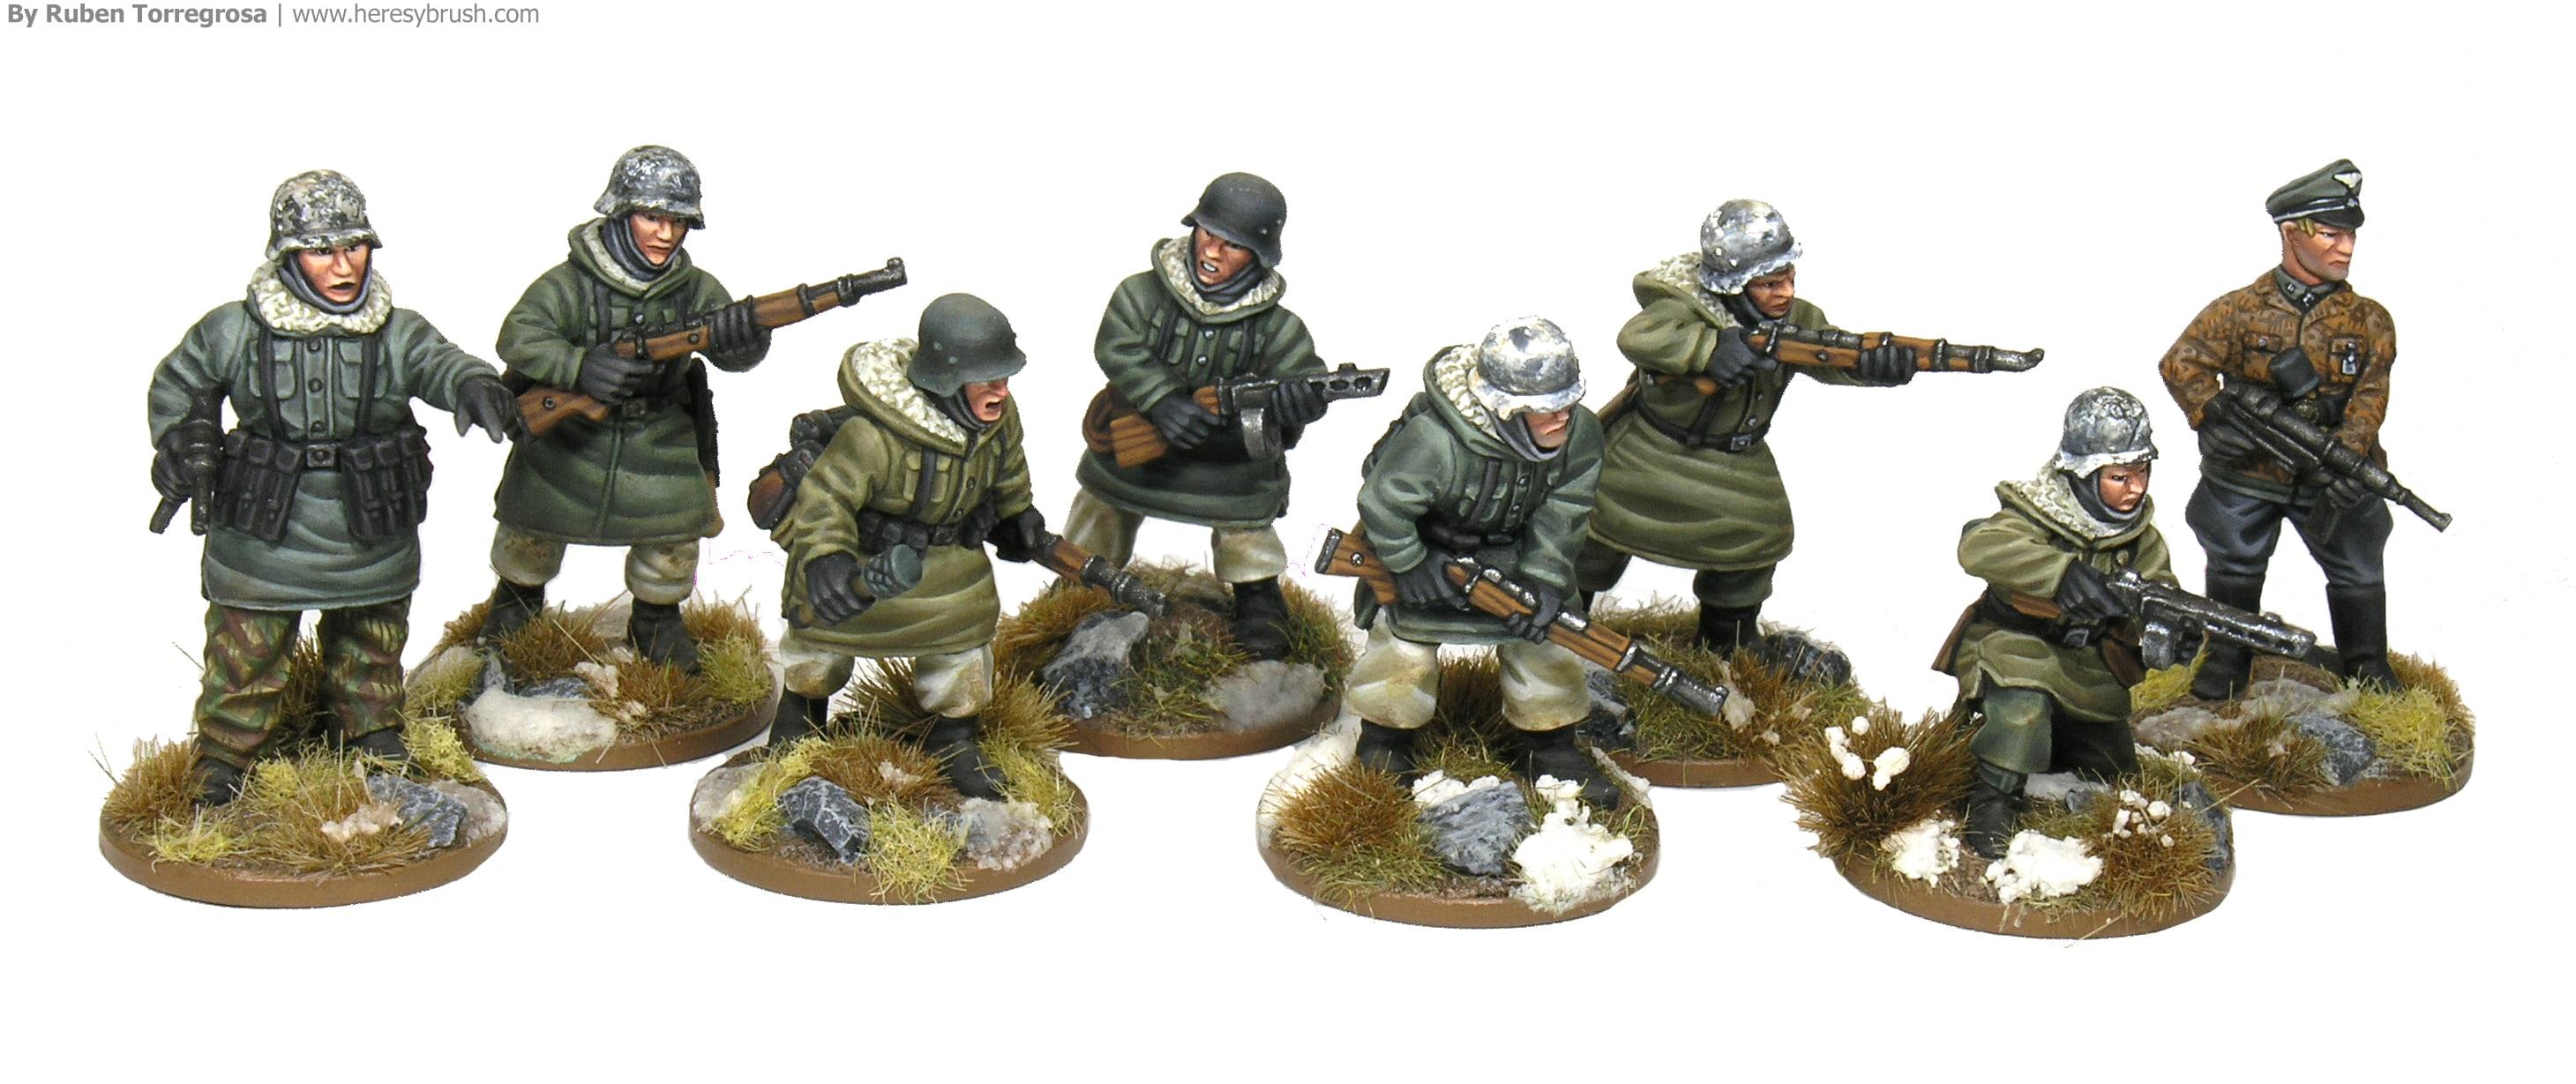 Kharkov heer46 miniatures